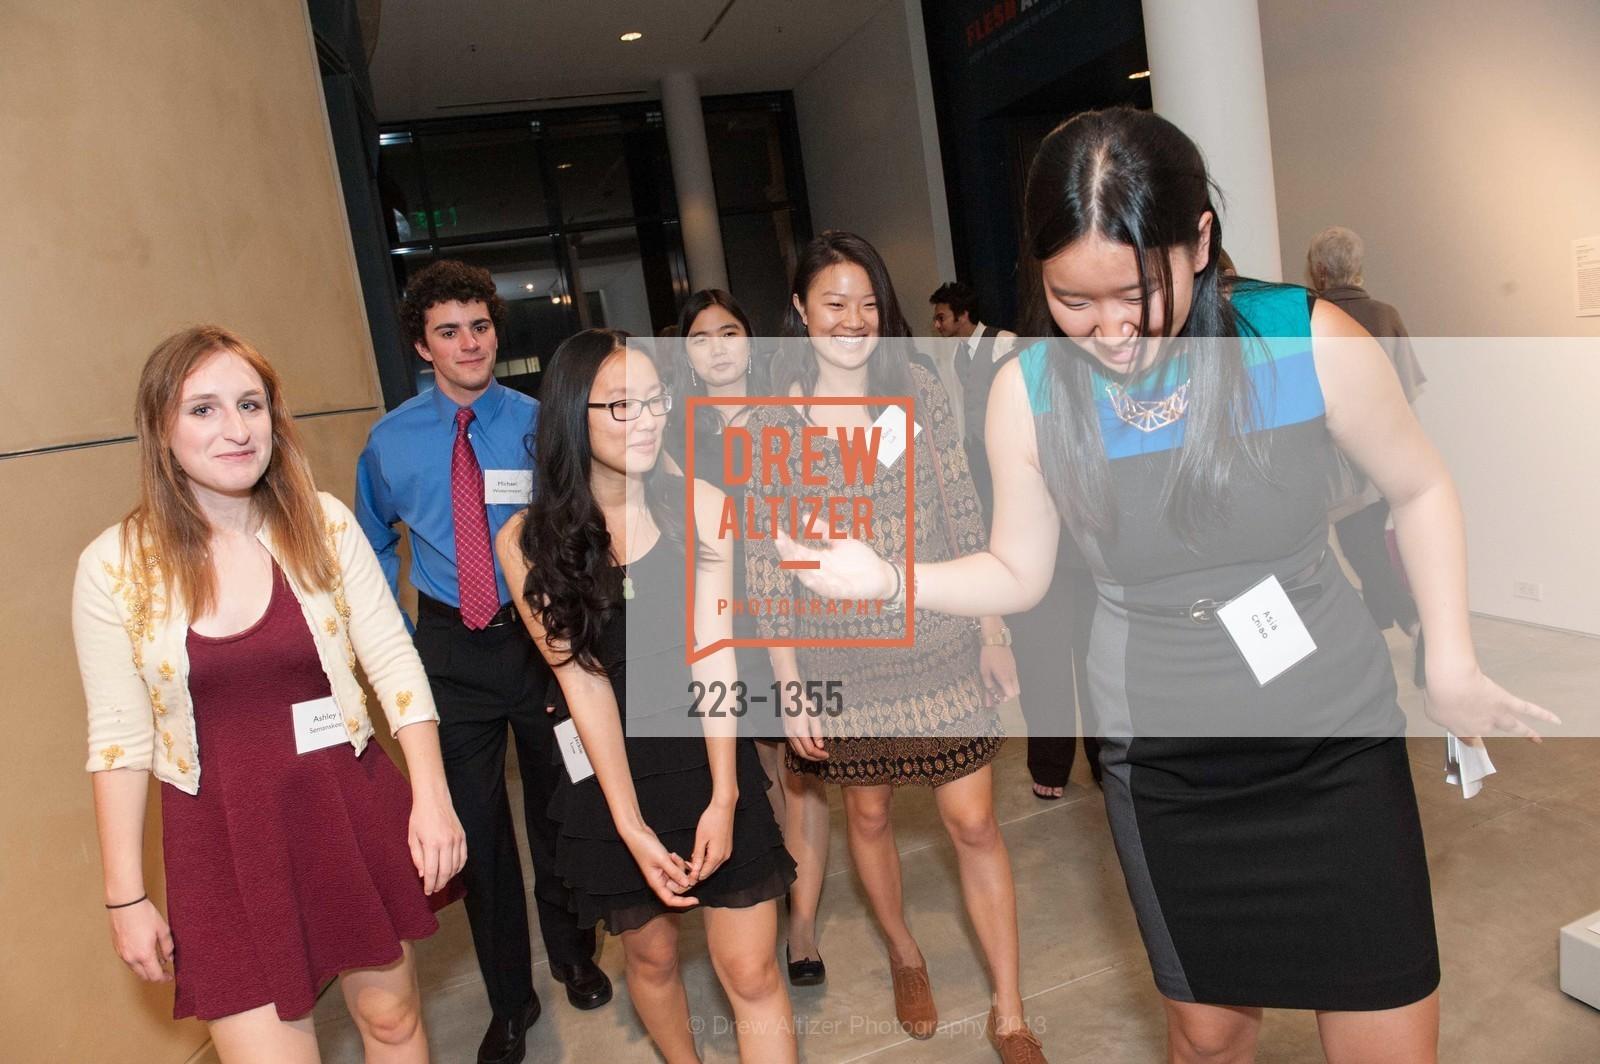 Ashley Semanskee, Michael Wintermeyer, Jackie Low, Alina Luk, Asia Chiao, Photo #223-1355